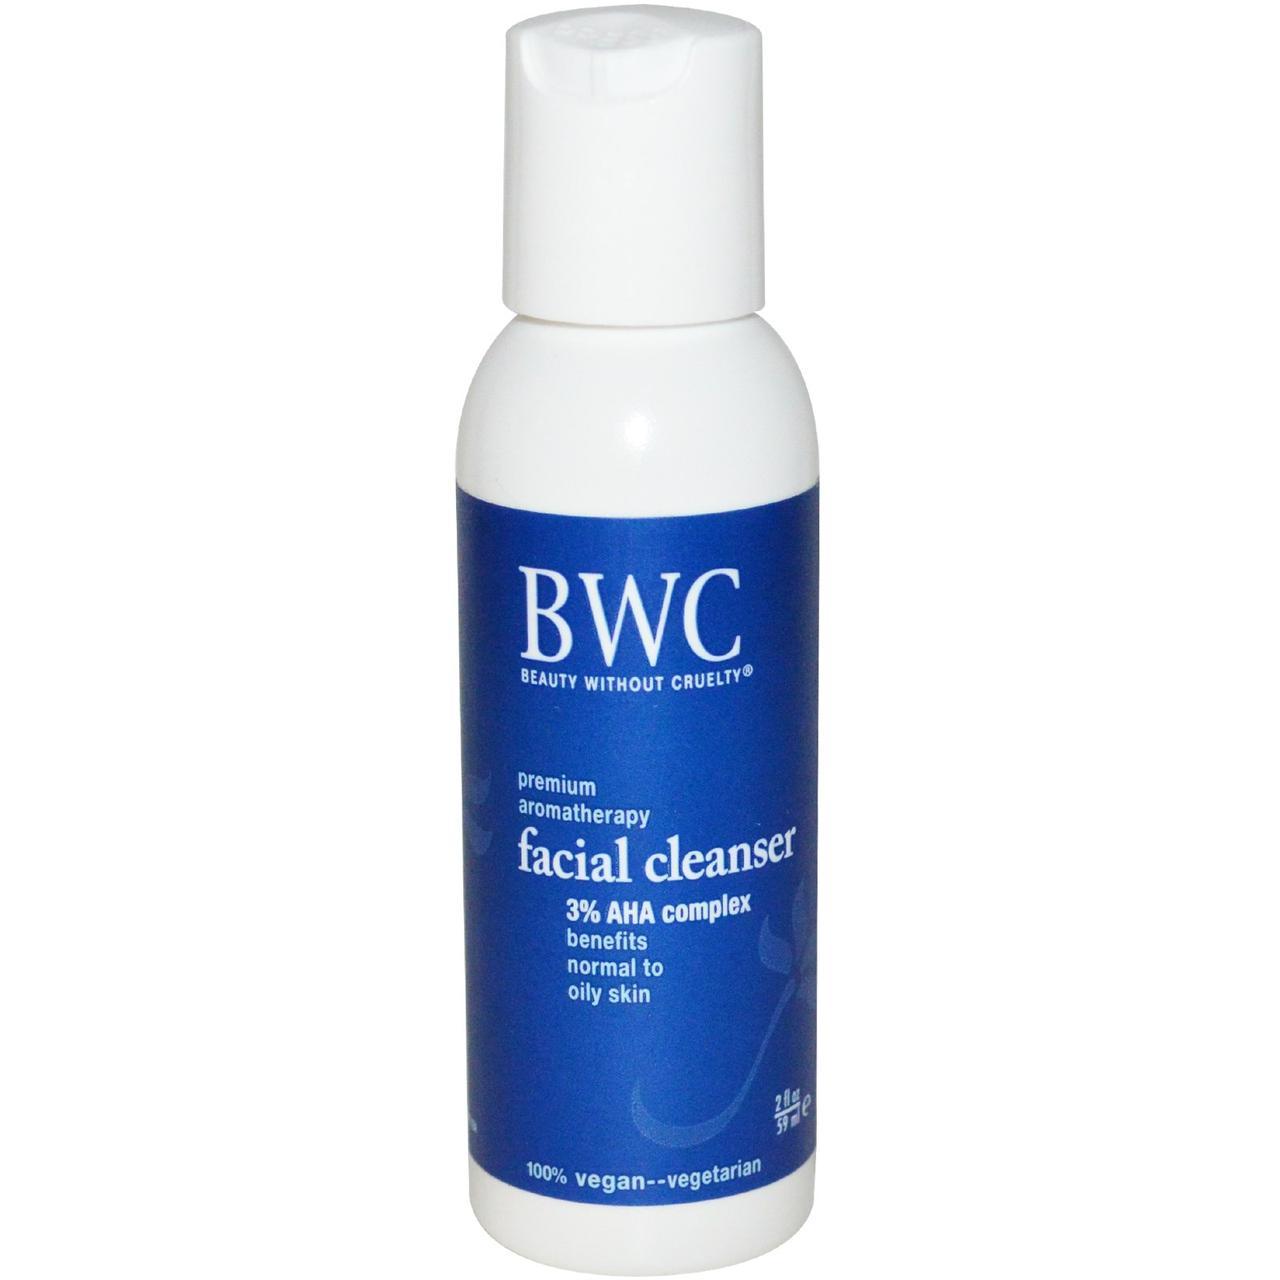 Beauty Without Cruelty, 3% комплекс AHA-кислот для очистки кожи лица, 59 мл (2 fl oz)